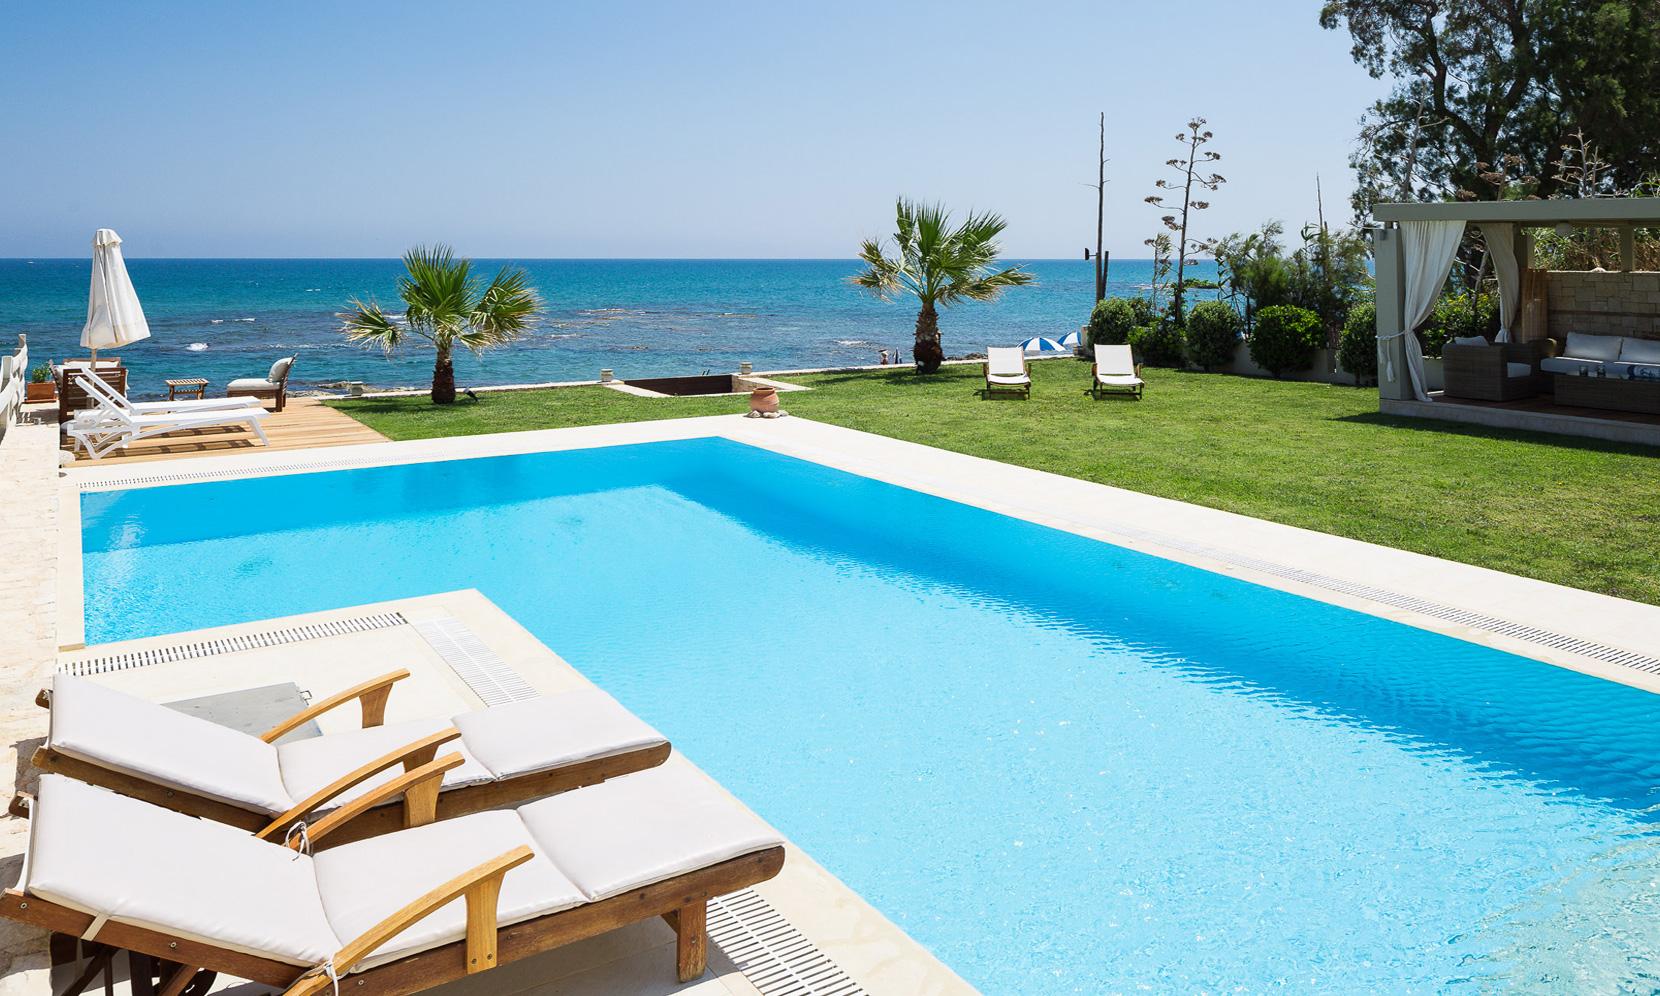 Crete Villa Icarus jumbotron image